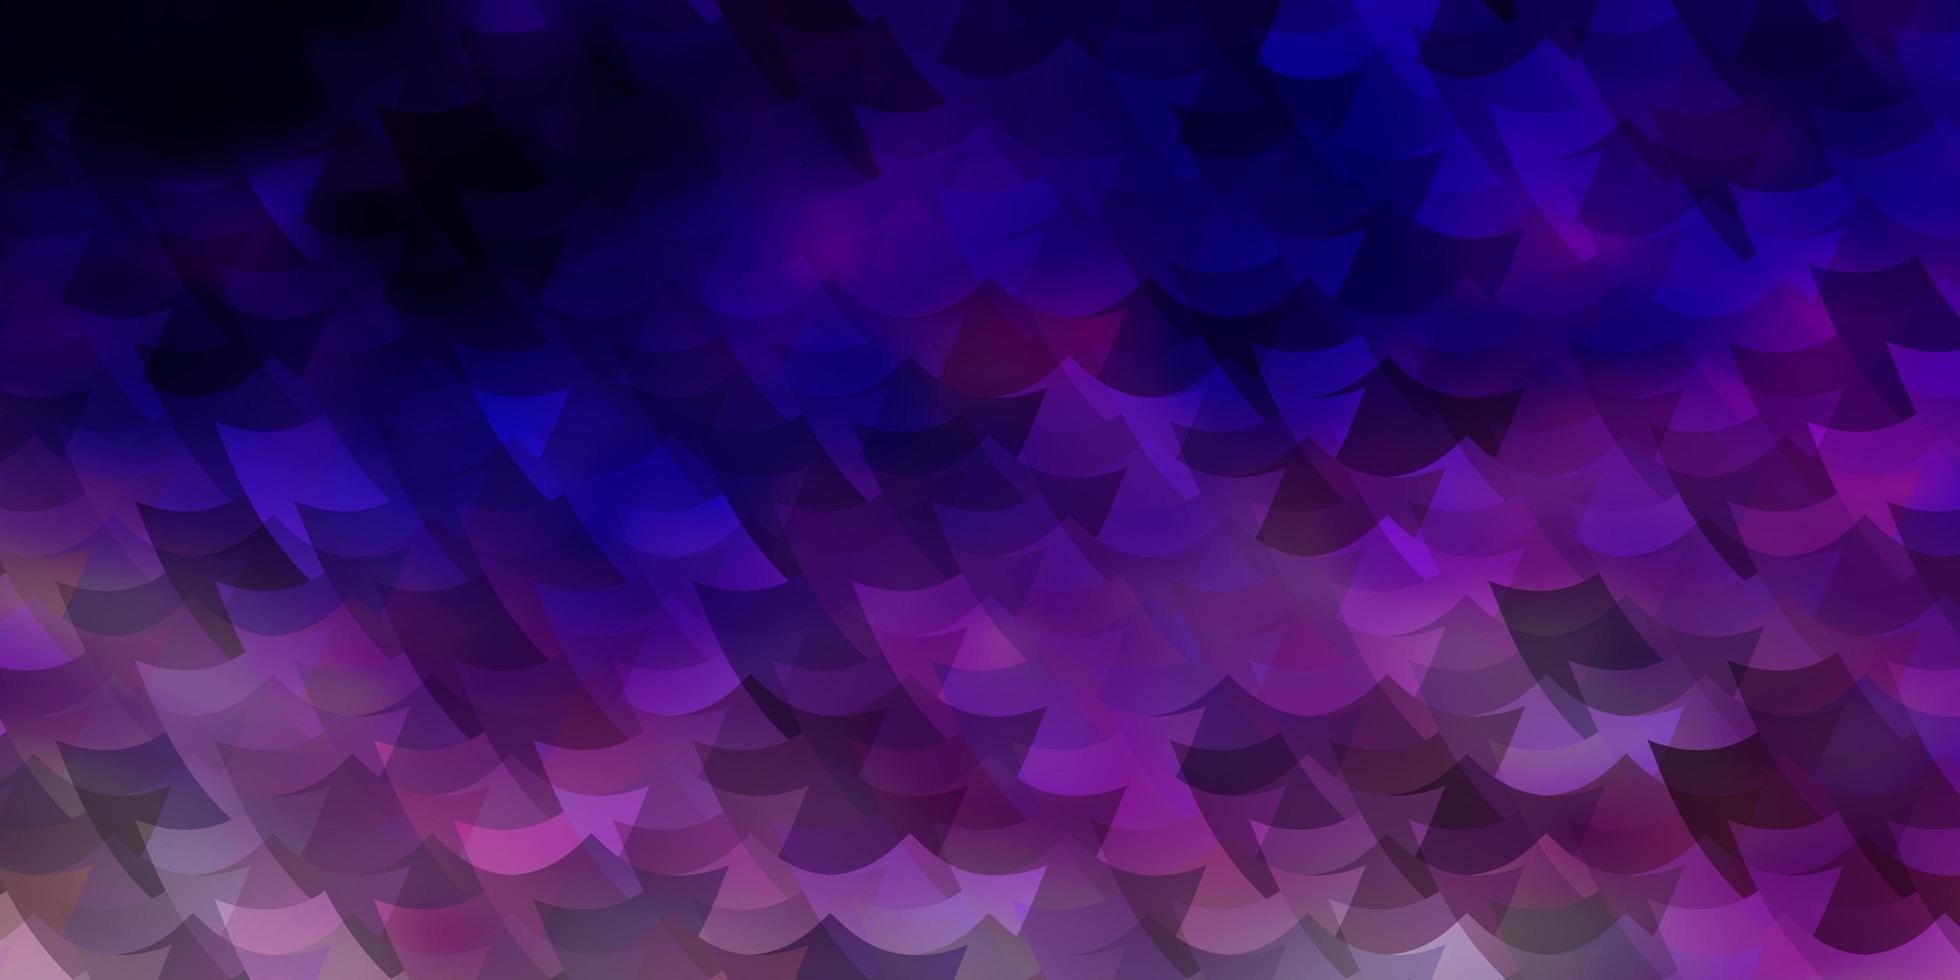 Fondo de vector violeta, rosa claro en estilo poligonal.